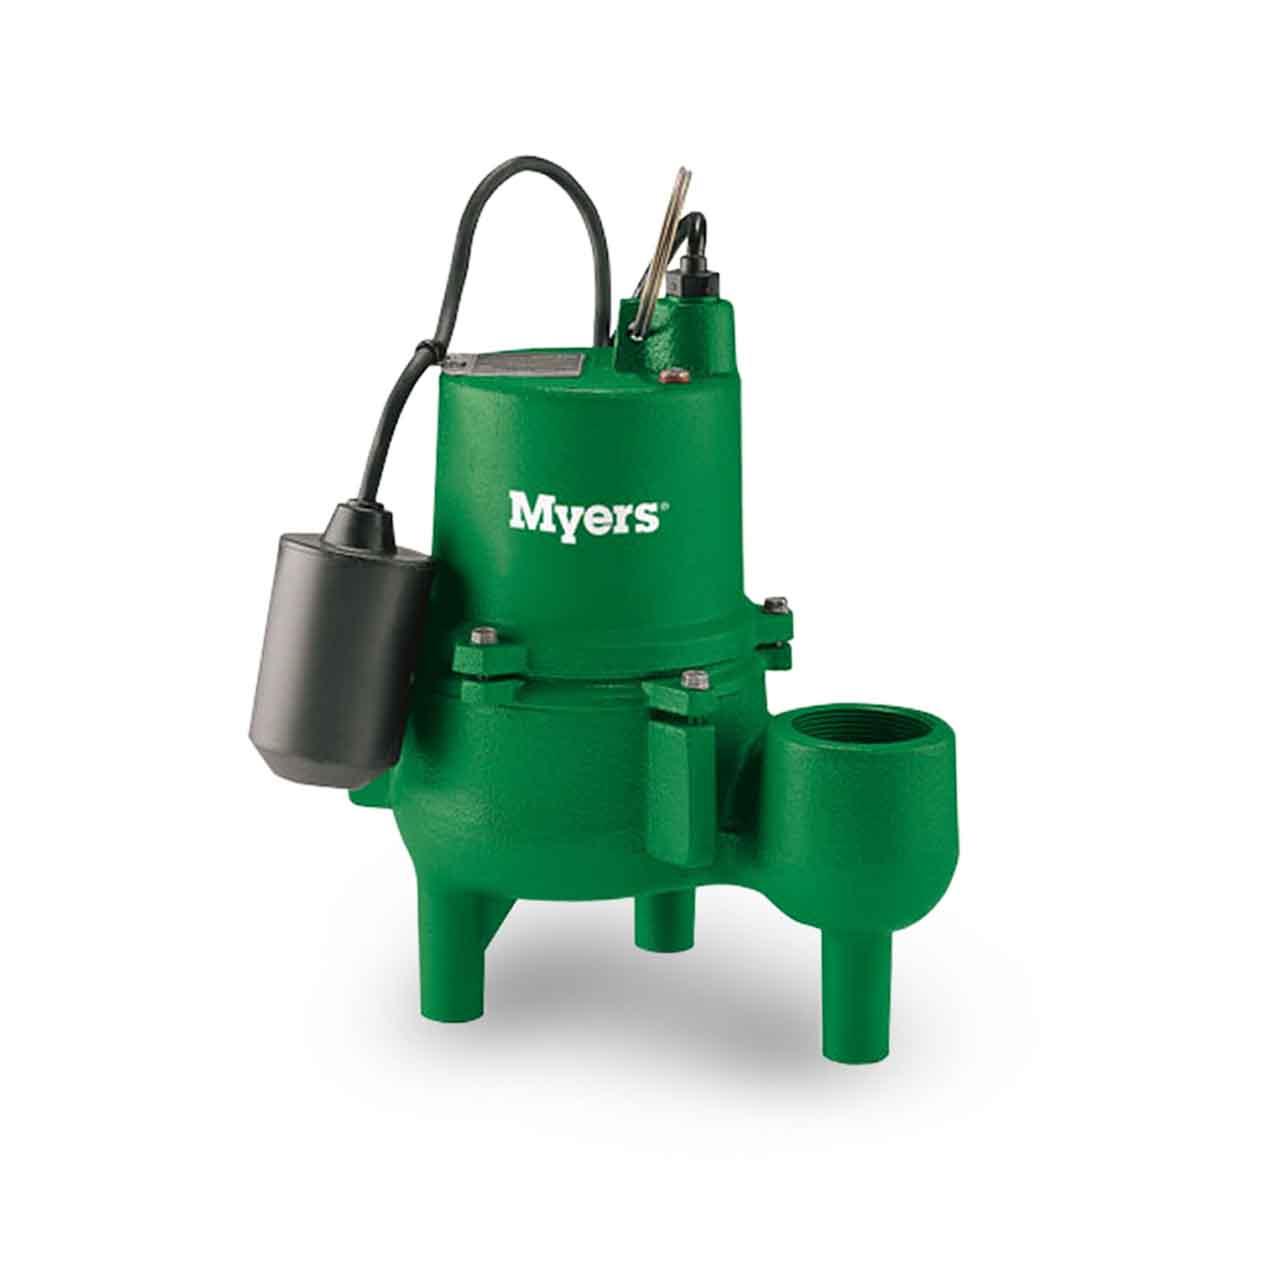 myers myers srm4m1c sewage pump 0 4 hp 115v 1 ph 20 cord manual myers myers srm4m1c sewage pump 0 4 hp 115v 1 ph 20 cord manual myrsrm4m1c